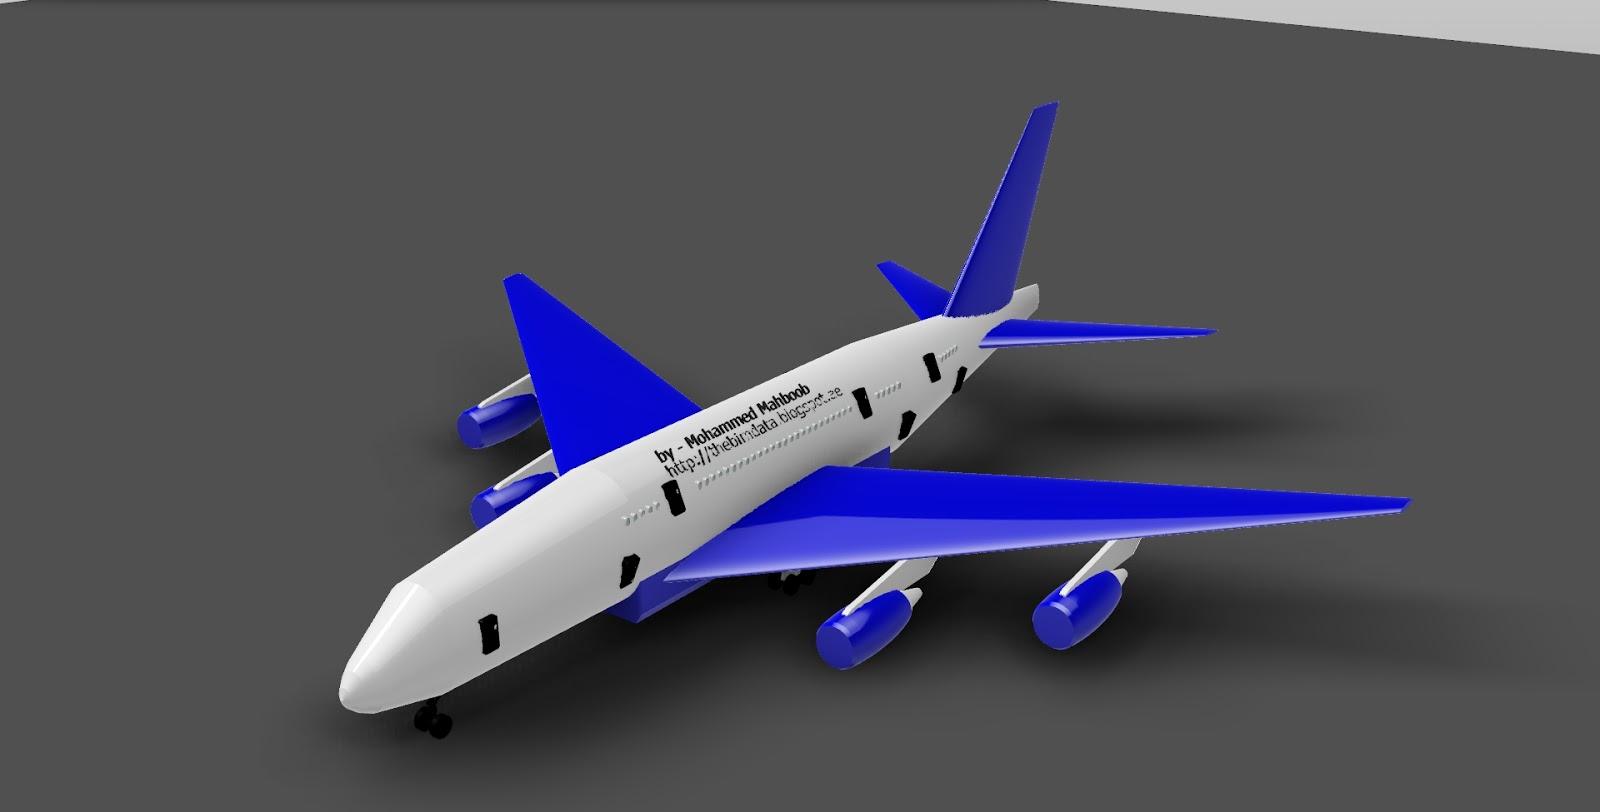 The BIM Data: Revit - Aeroplane 3D Model